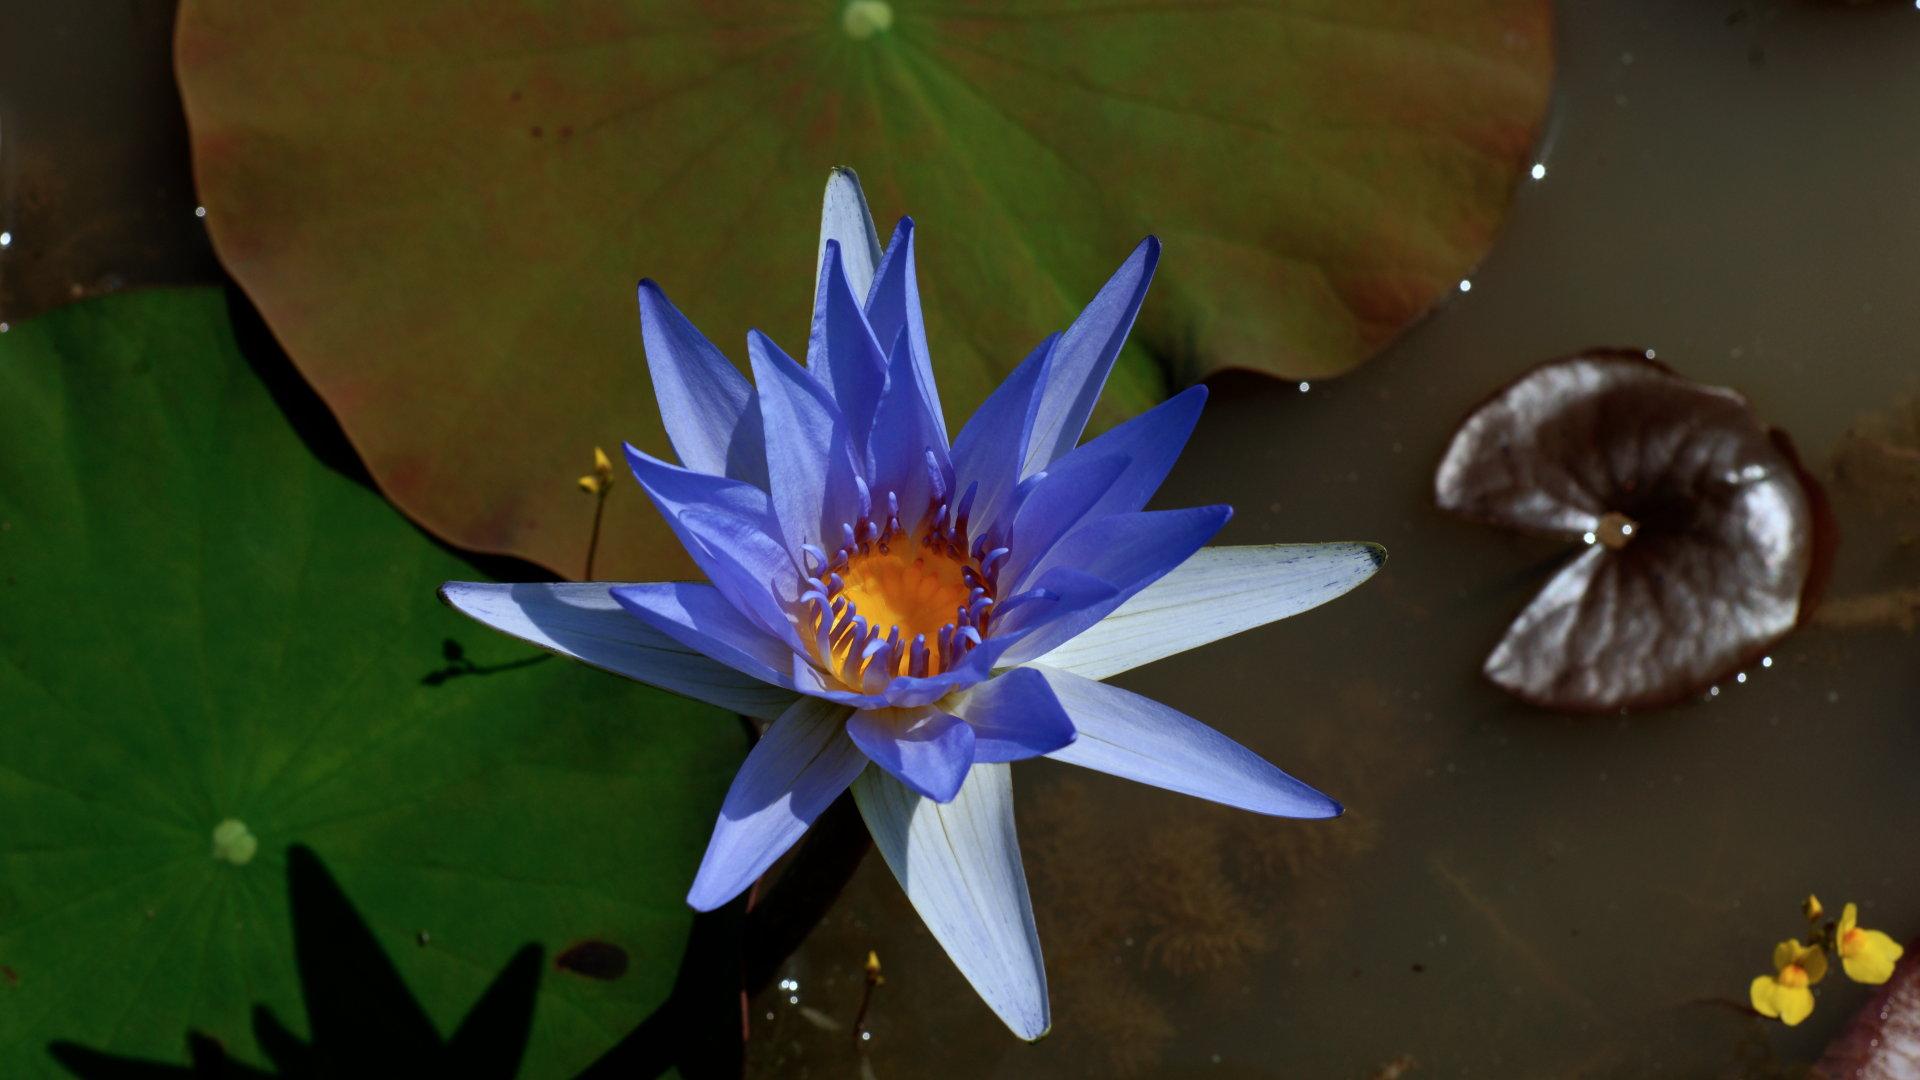 Flower wallpaper blue water lily flower izmirmasajfo